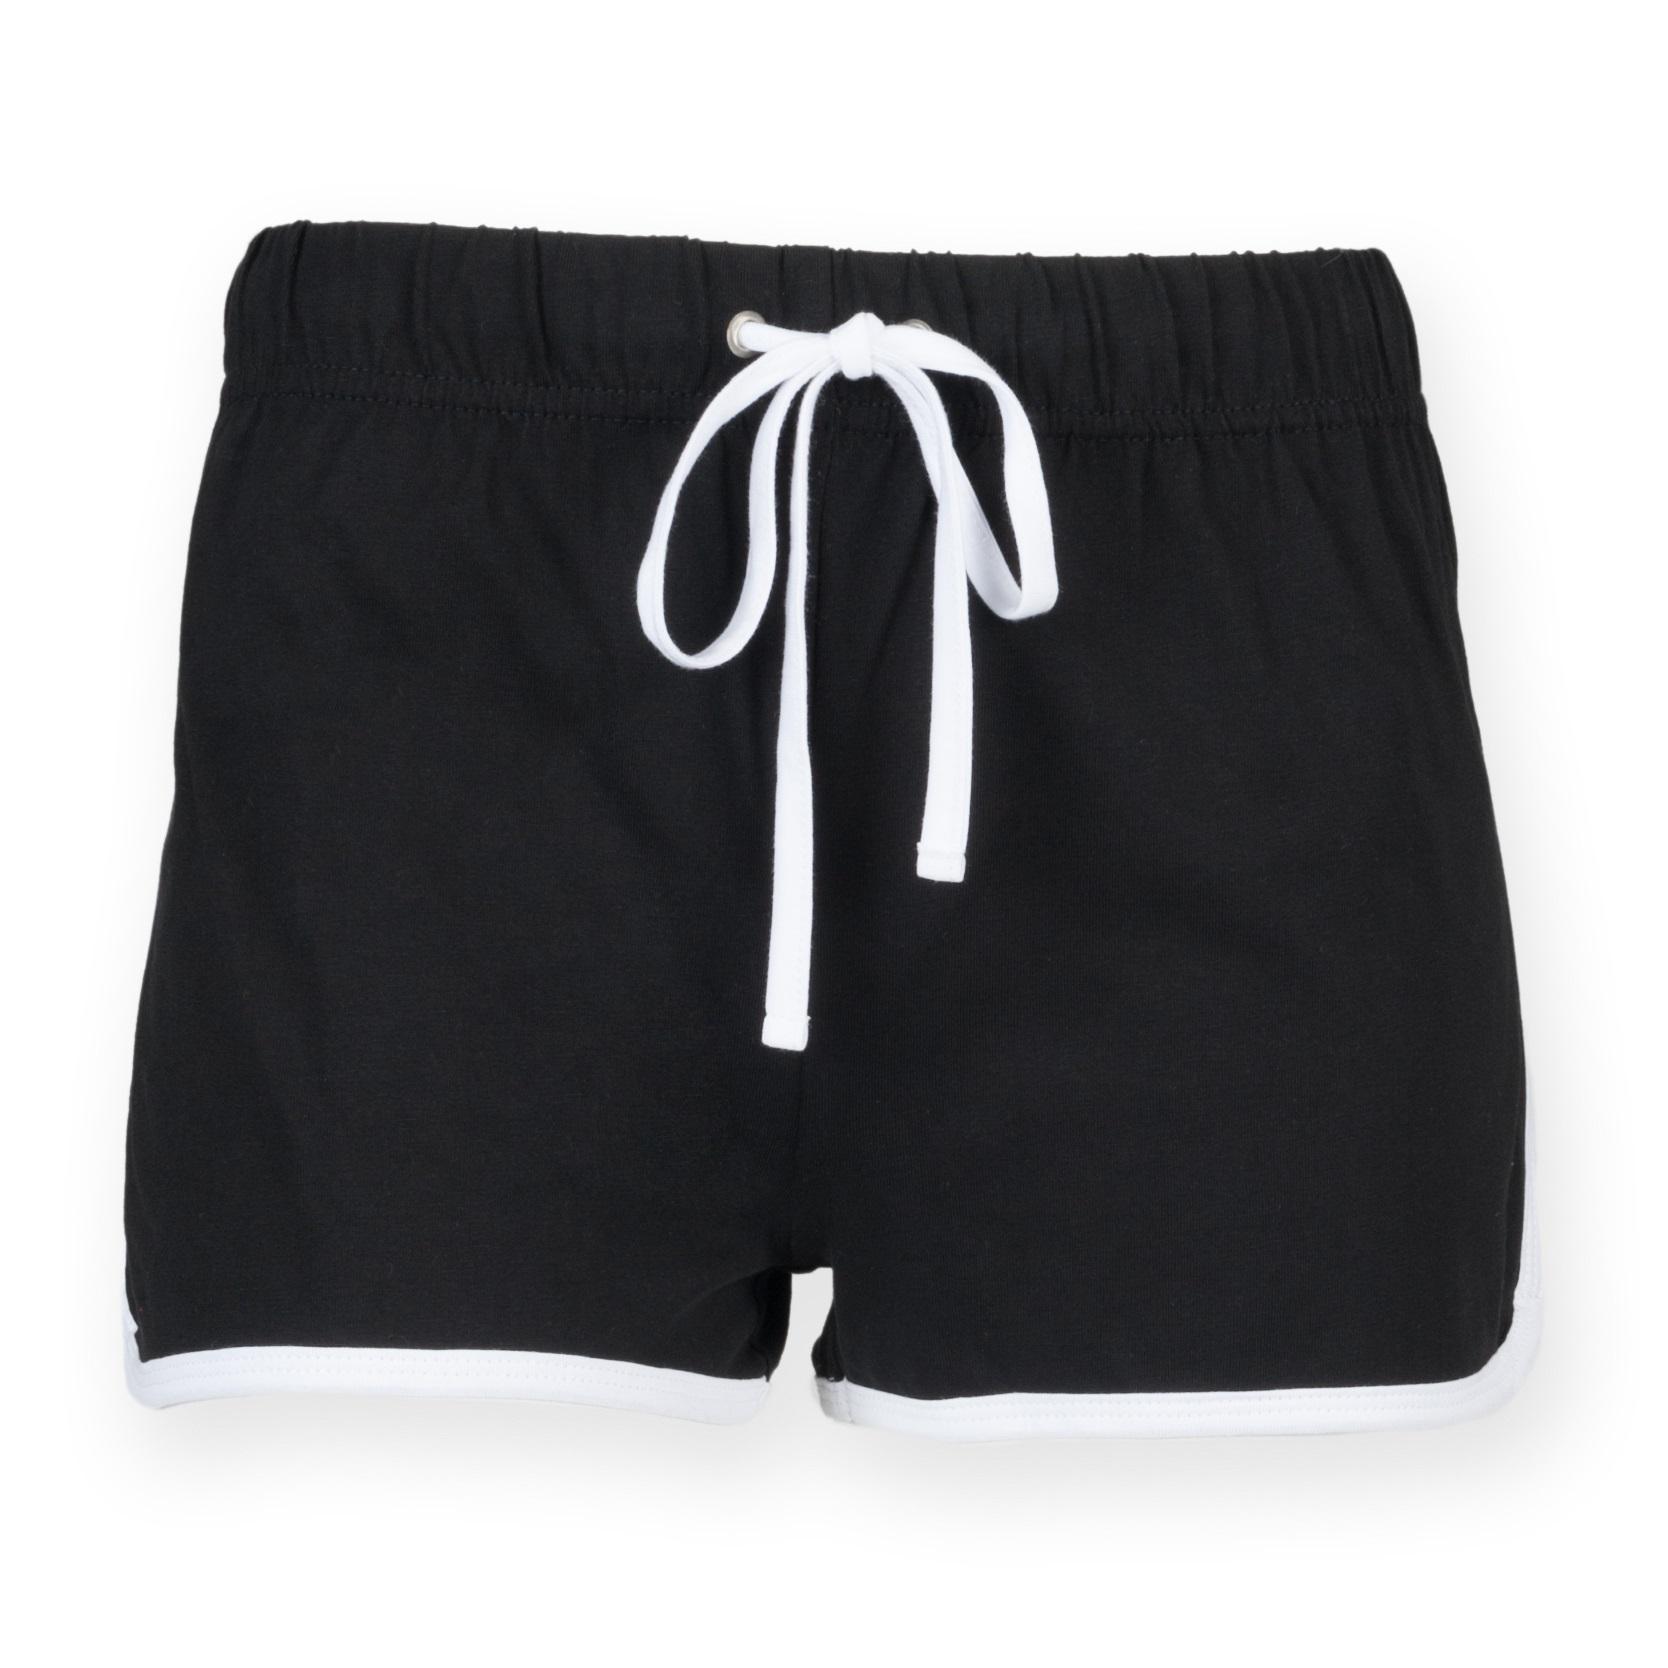 black retro shorts